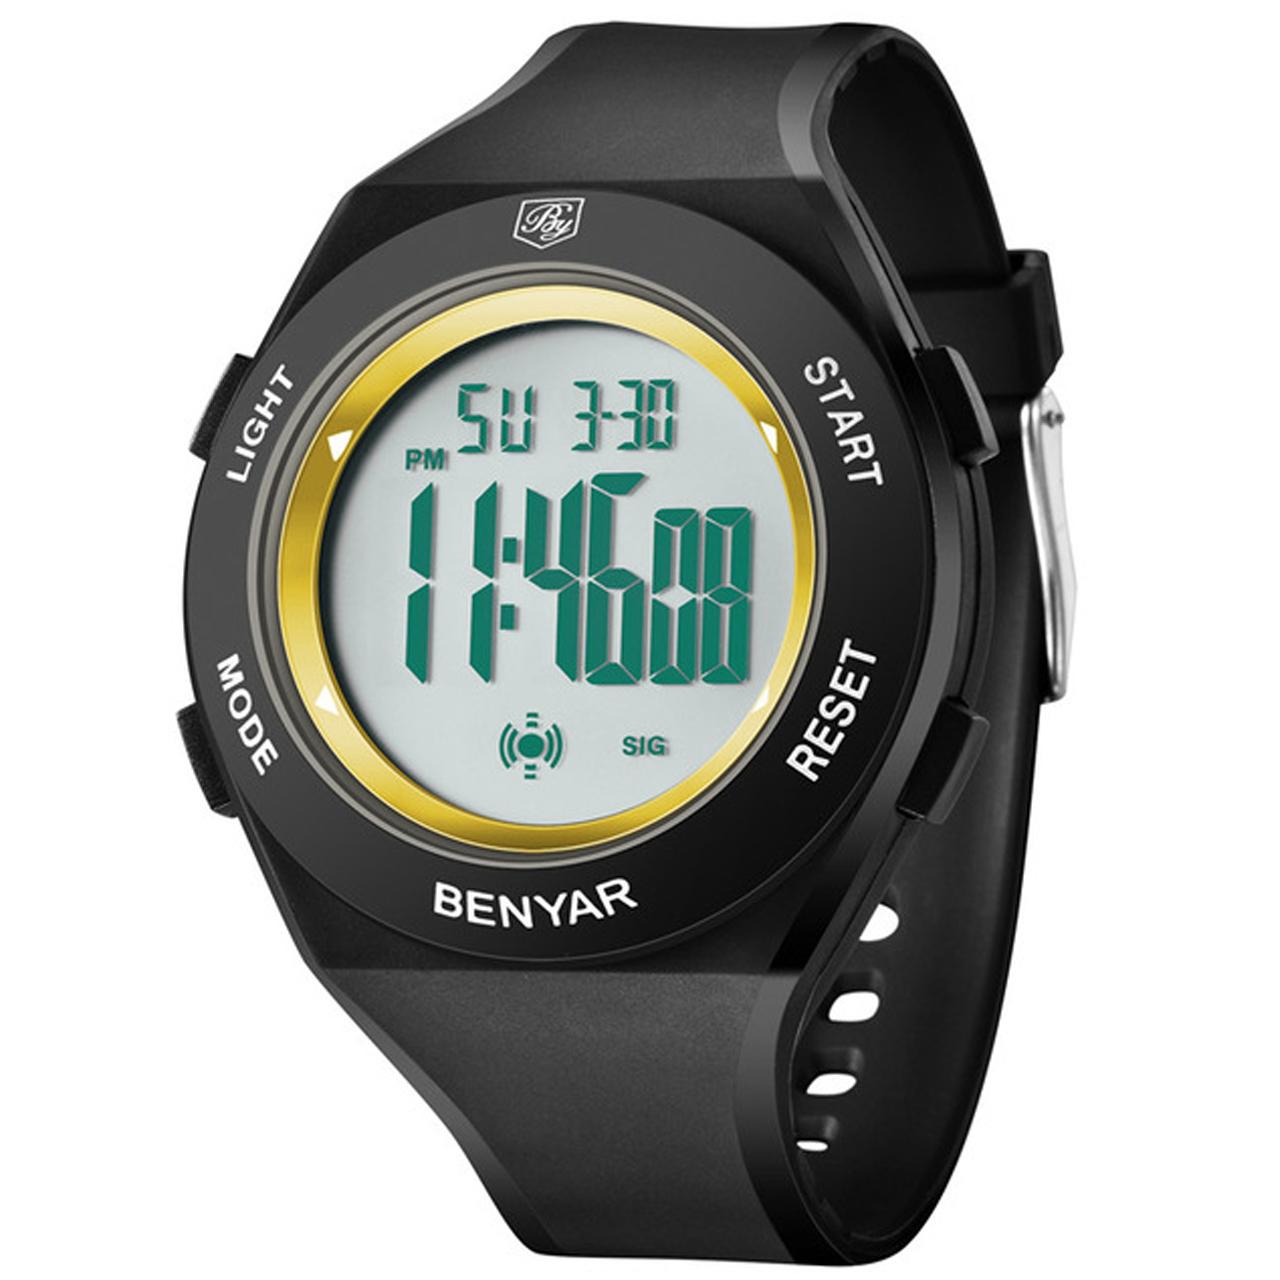 ساعت مچی دیجیتالی مردانه بنیار مدل 8003G 10